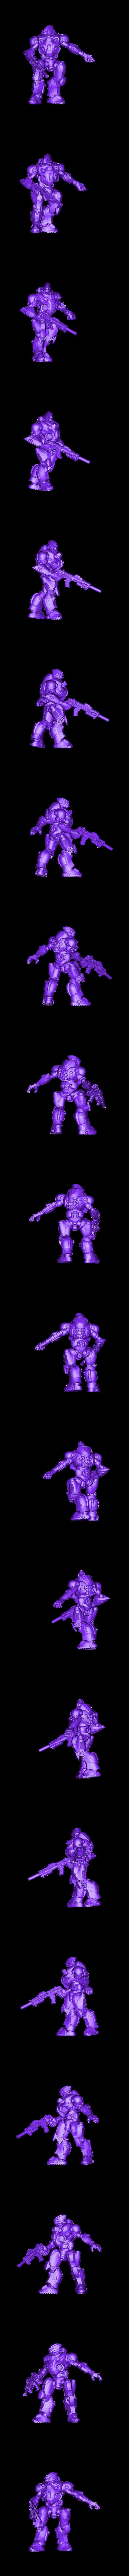 Mecha2.stl Download free STL file Mecha x2 • 3D print model, duncanshadow